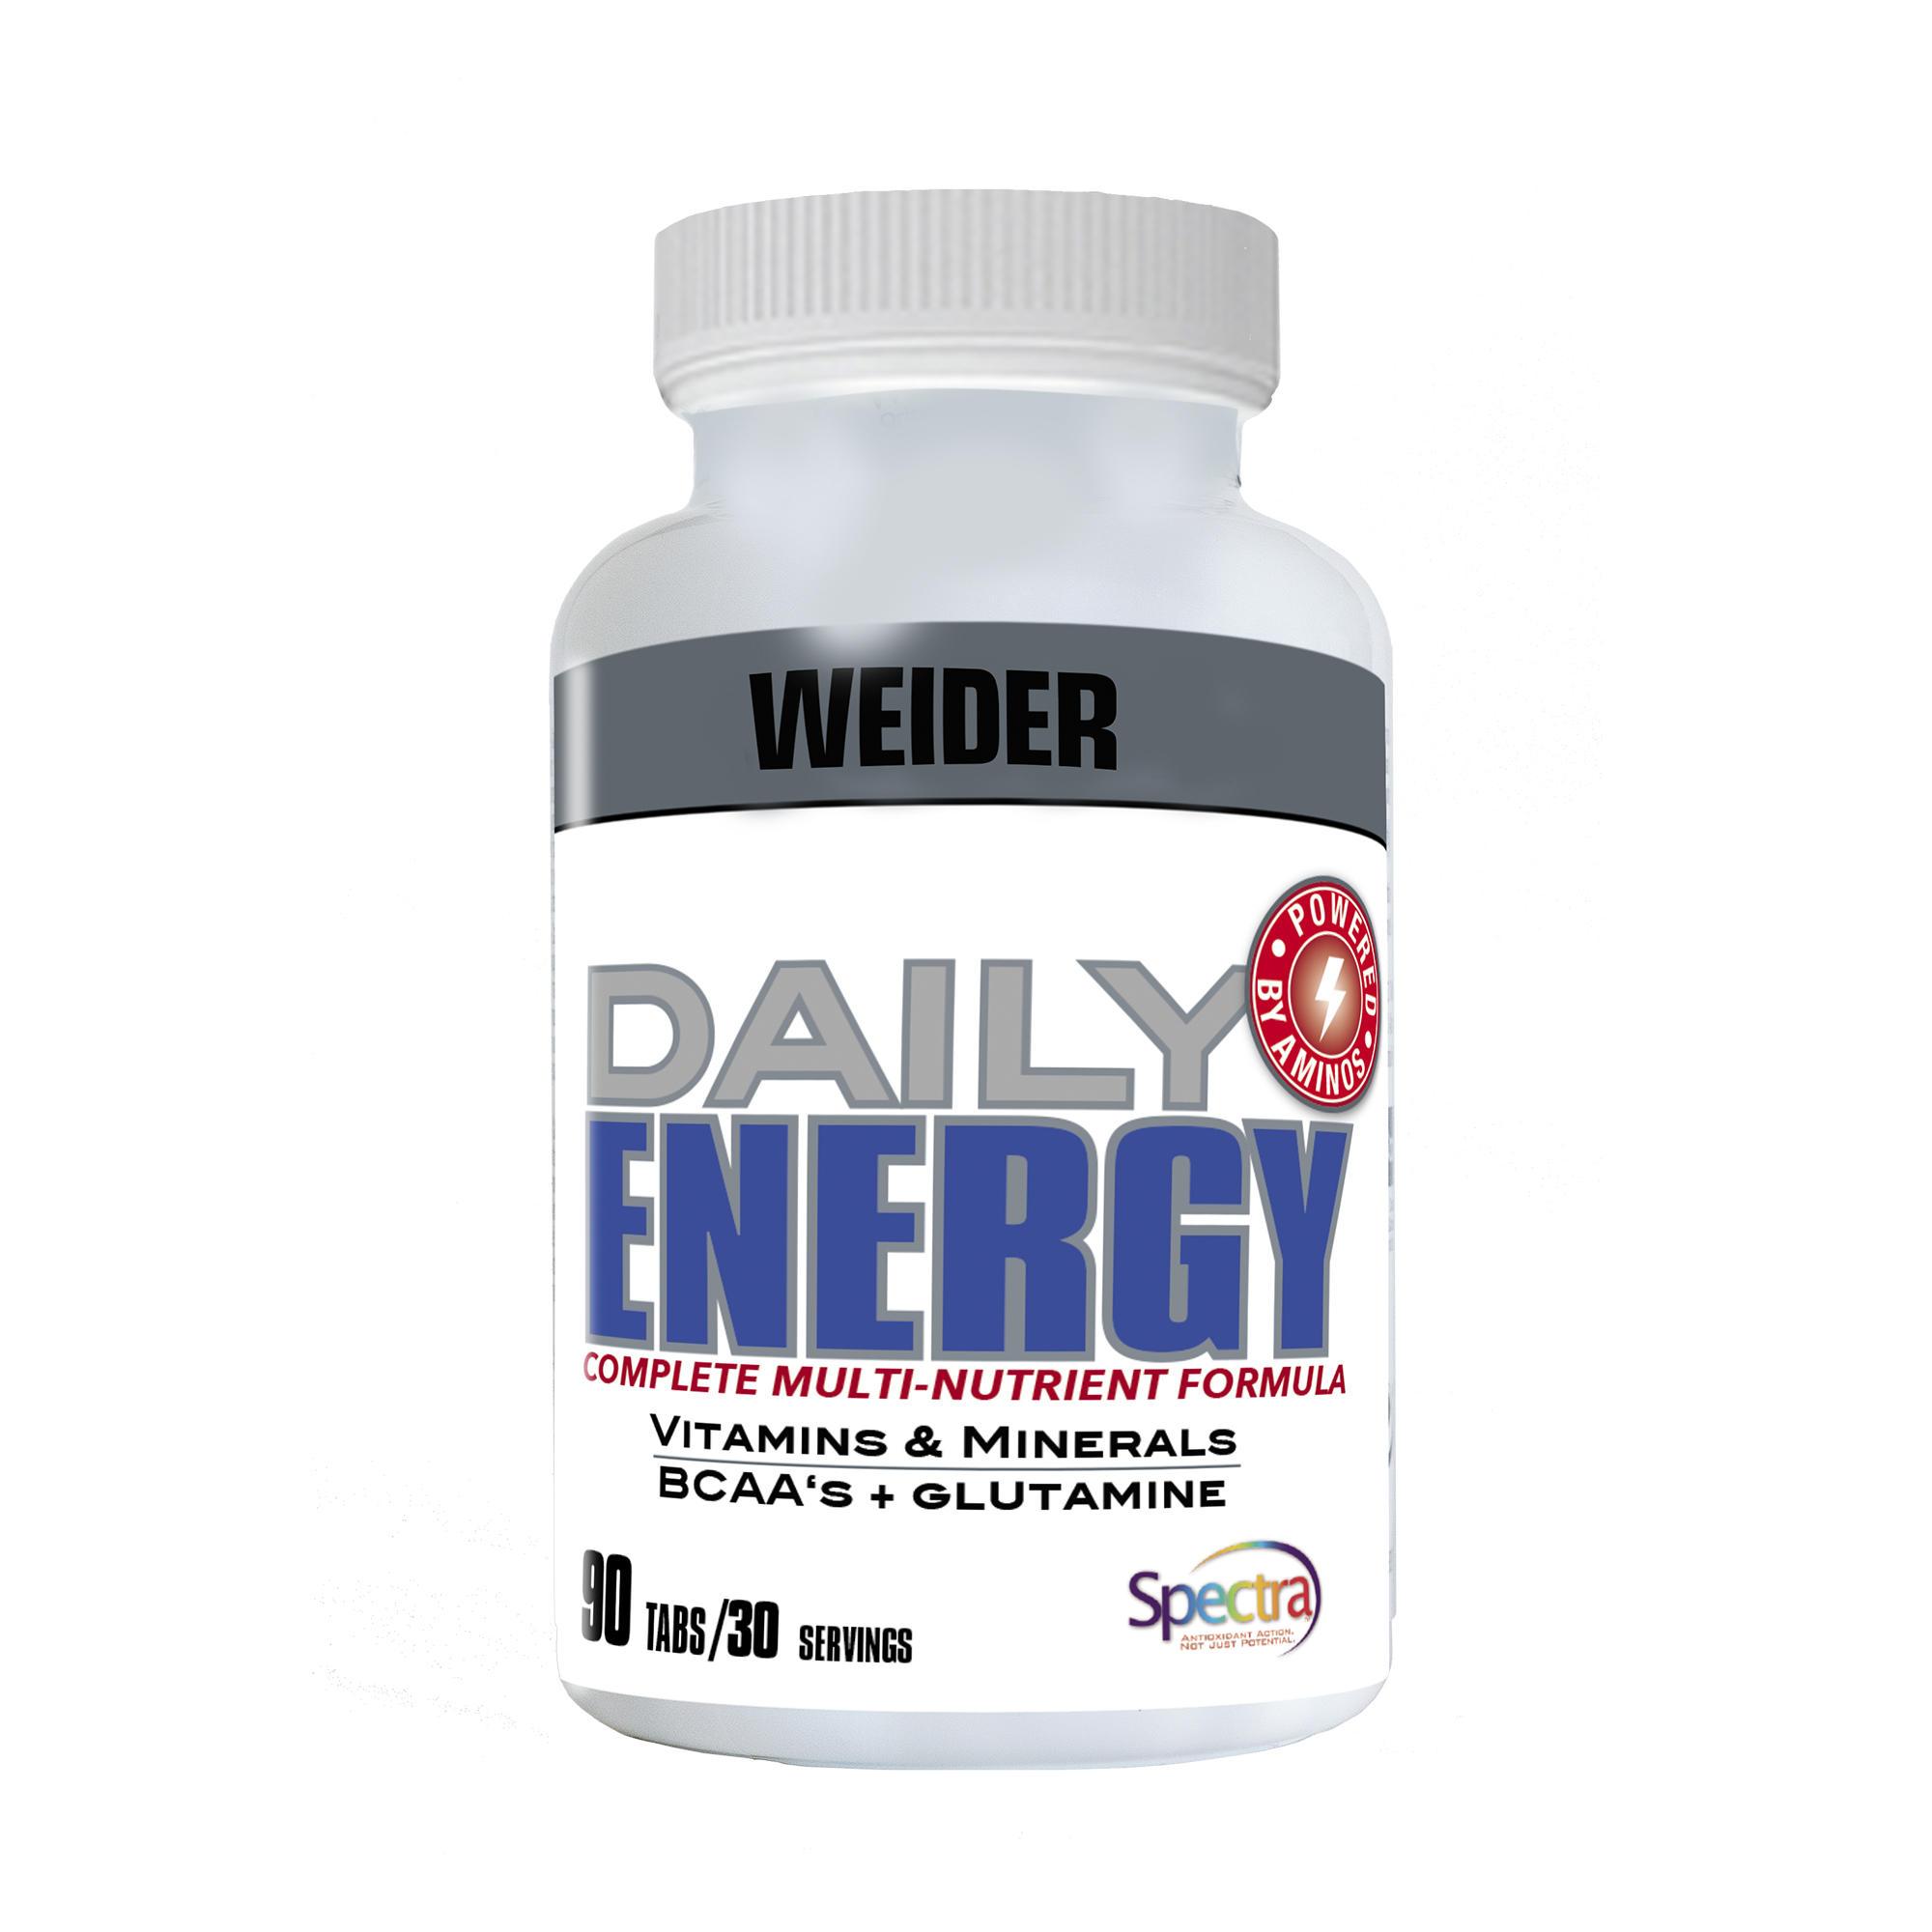 Daily Energy Weider de la WEIDER